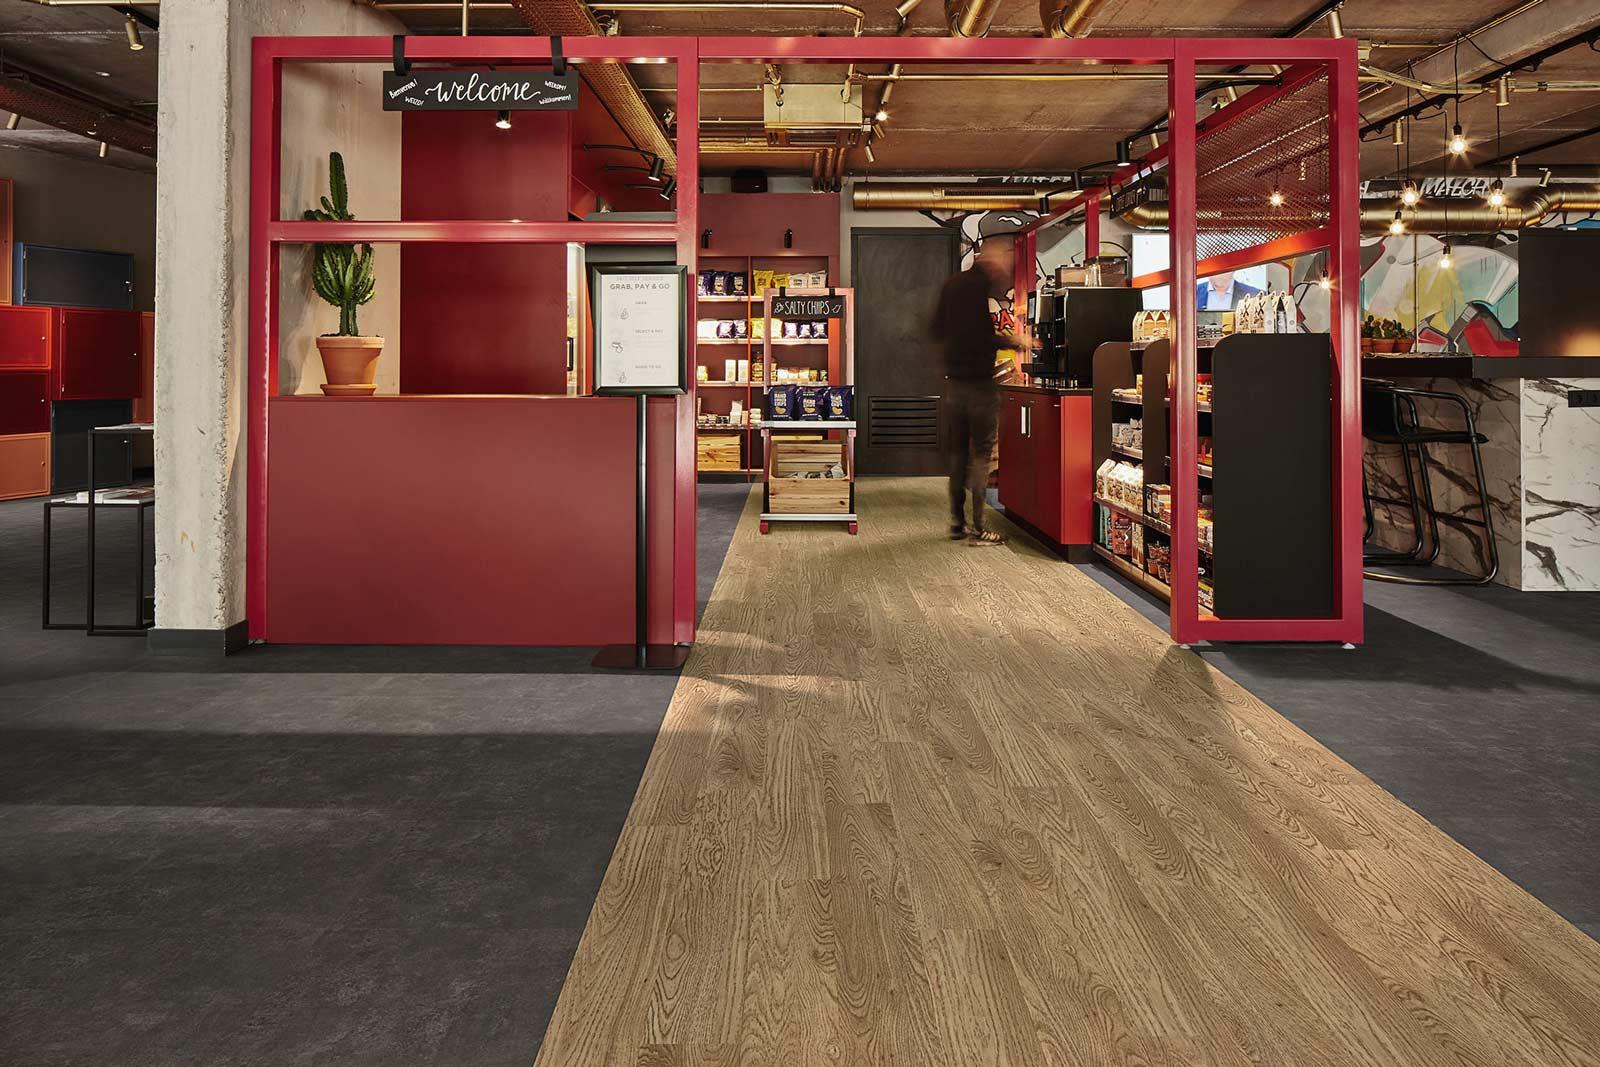 Vinylboden Nero Concrete – Schwarzgraue Zement Optik aus hochwertigen Materialien – Kostenloses Muster bestellen!